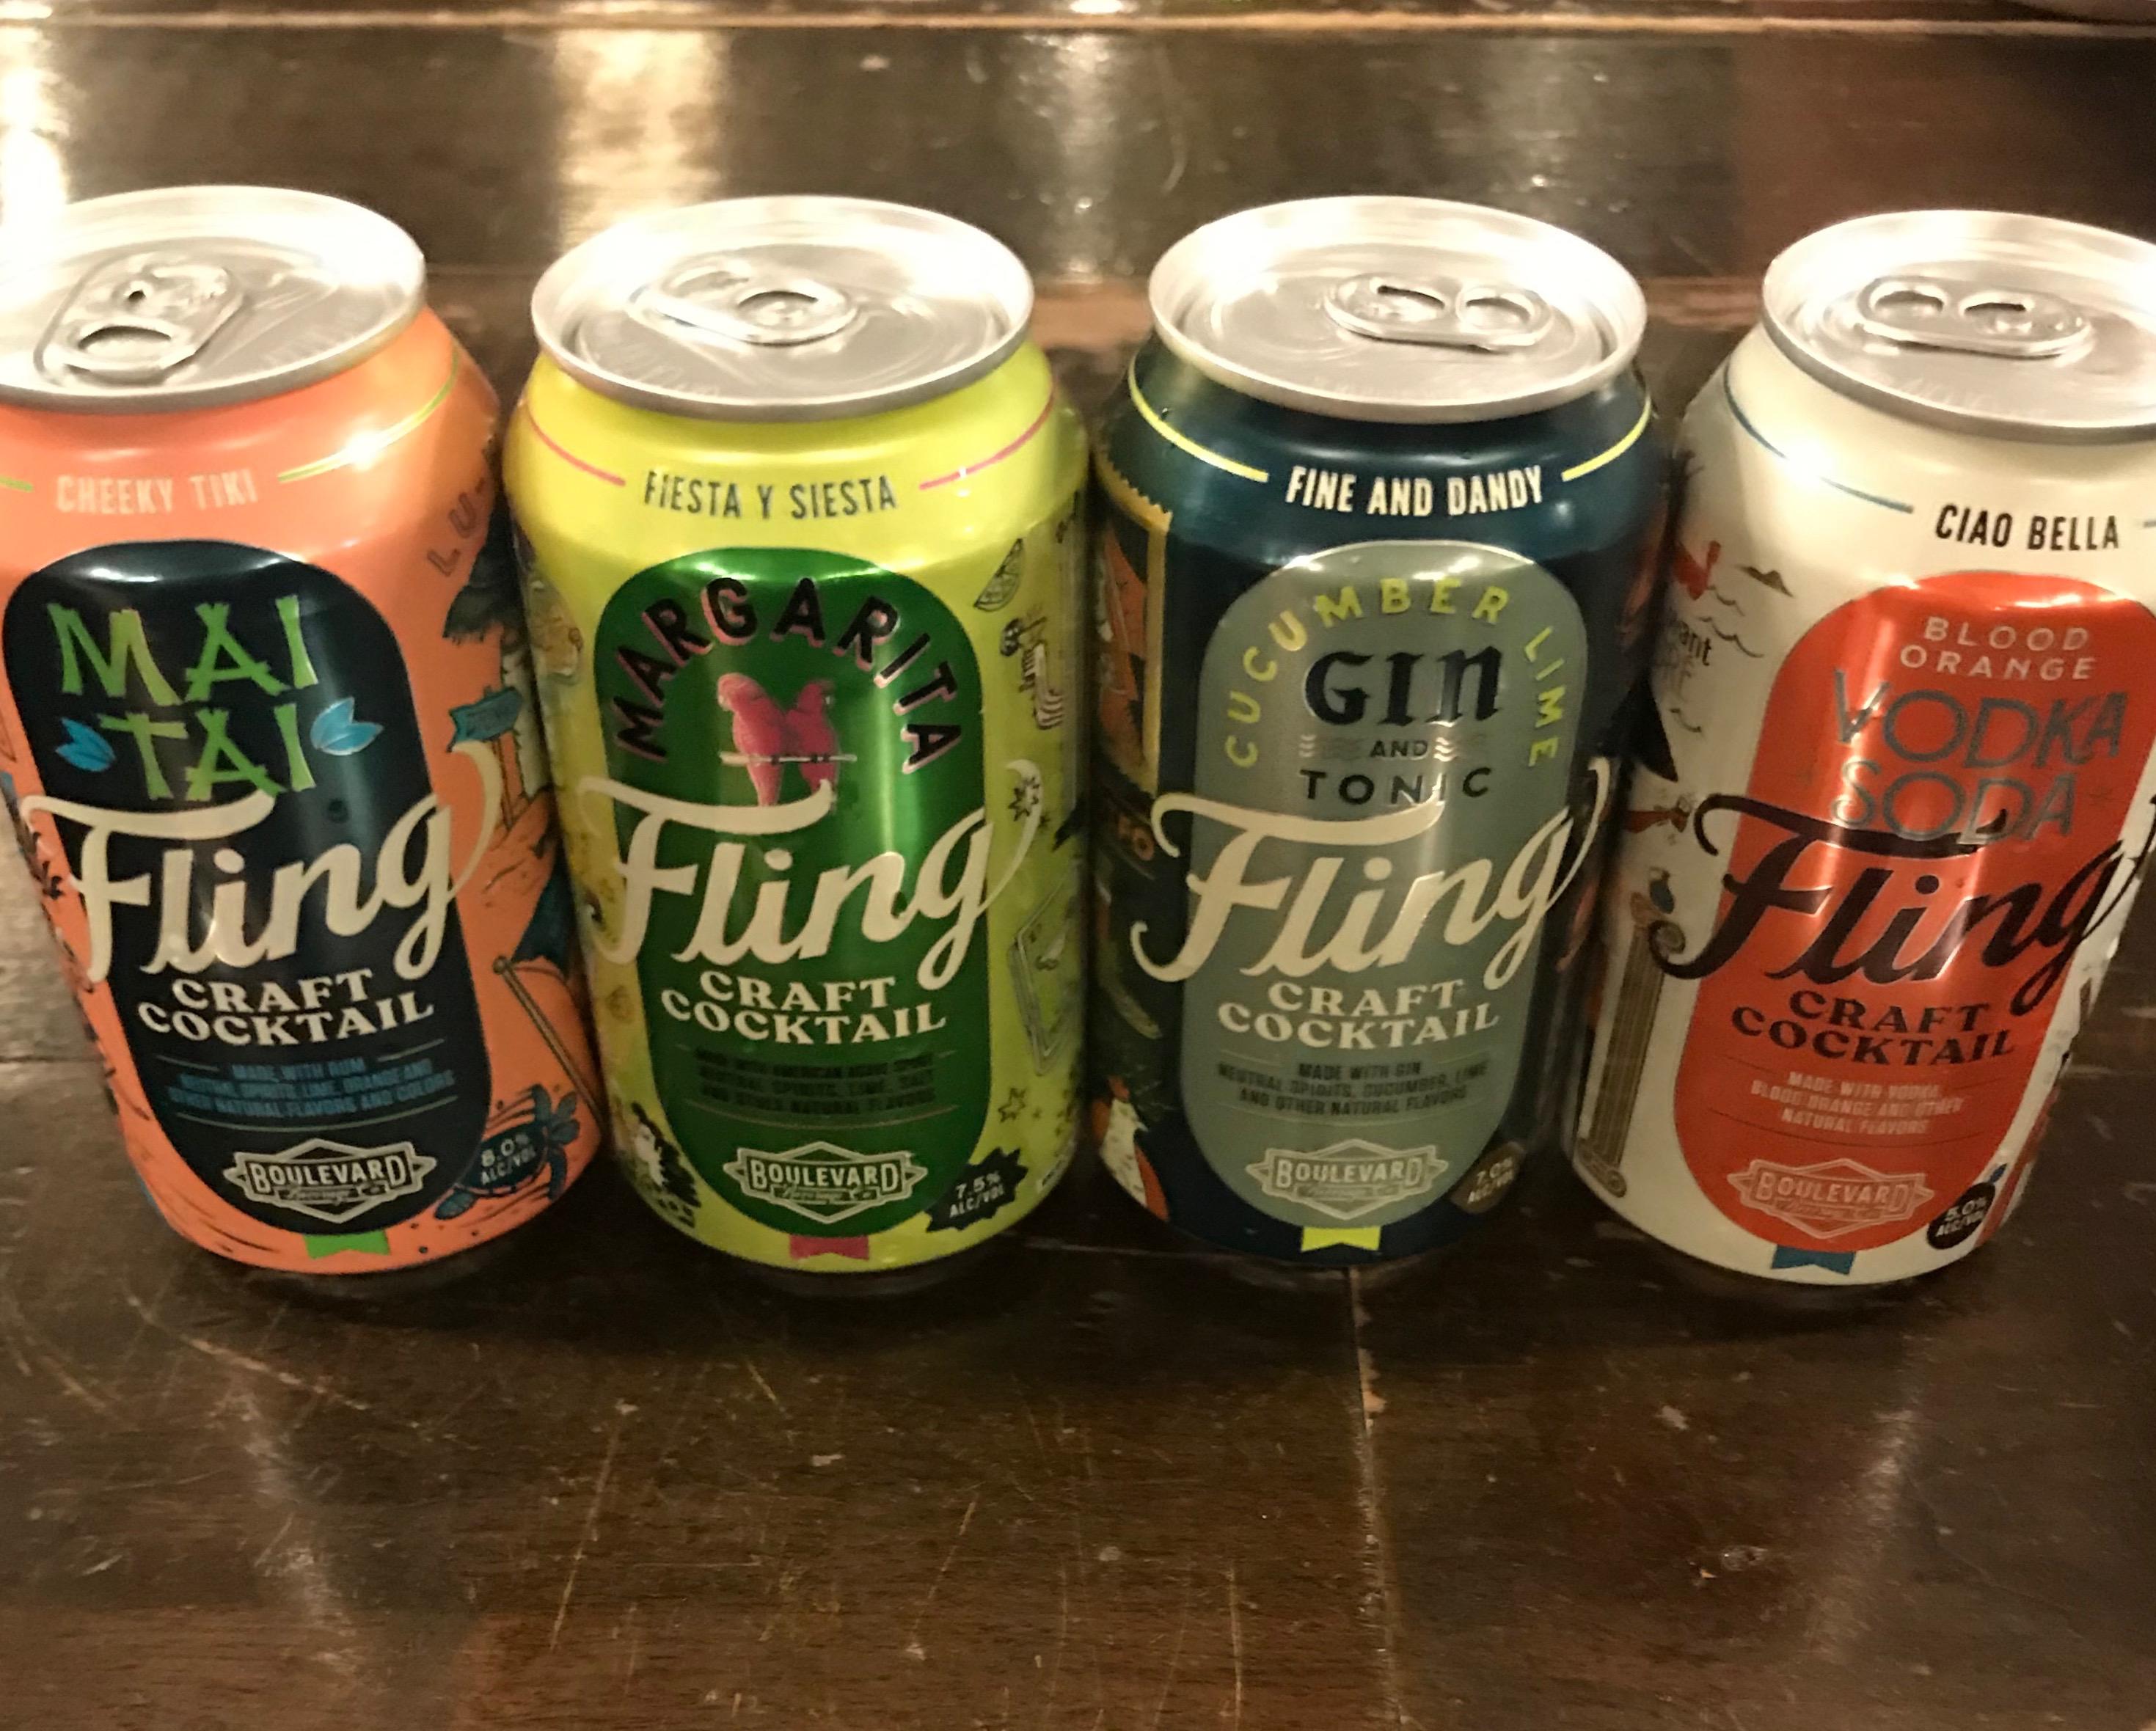 Boulevard Fling cans